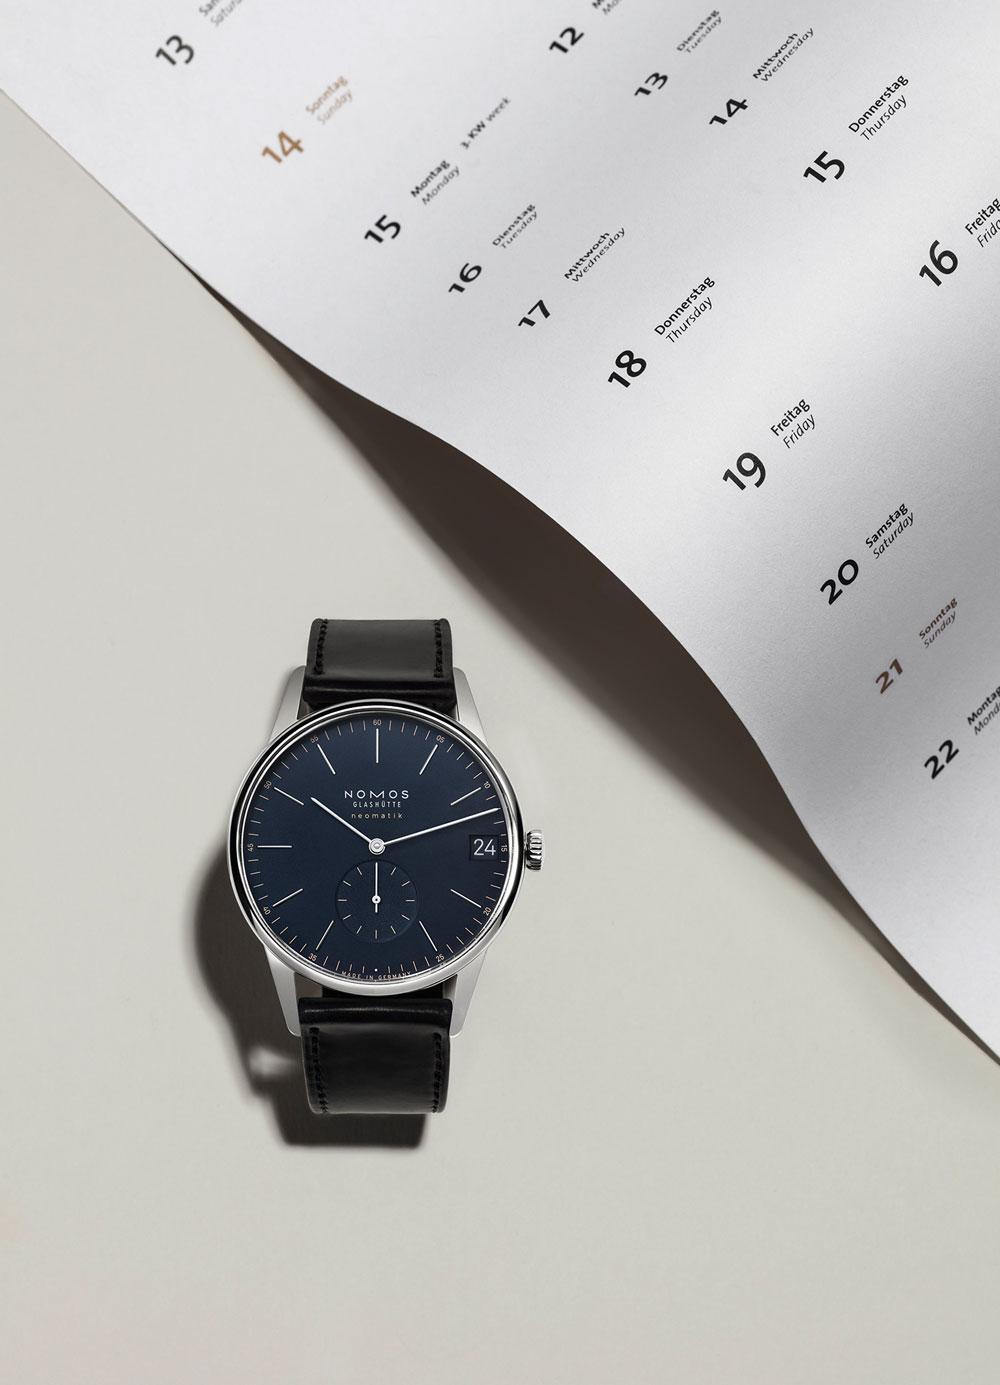 Reloj clásico hombre ultraplano Orion neomatik 41 mm Fecha de Nomos Glashütte